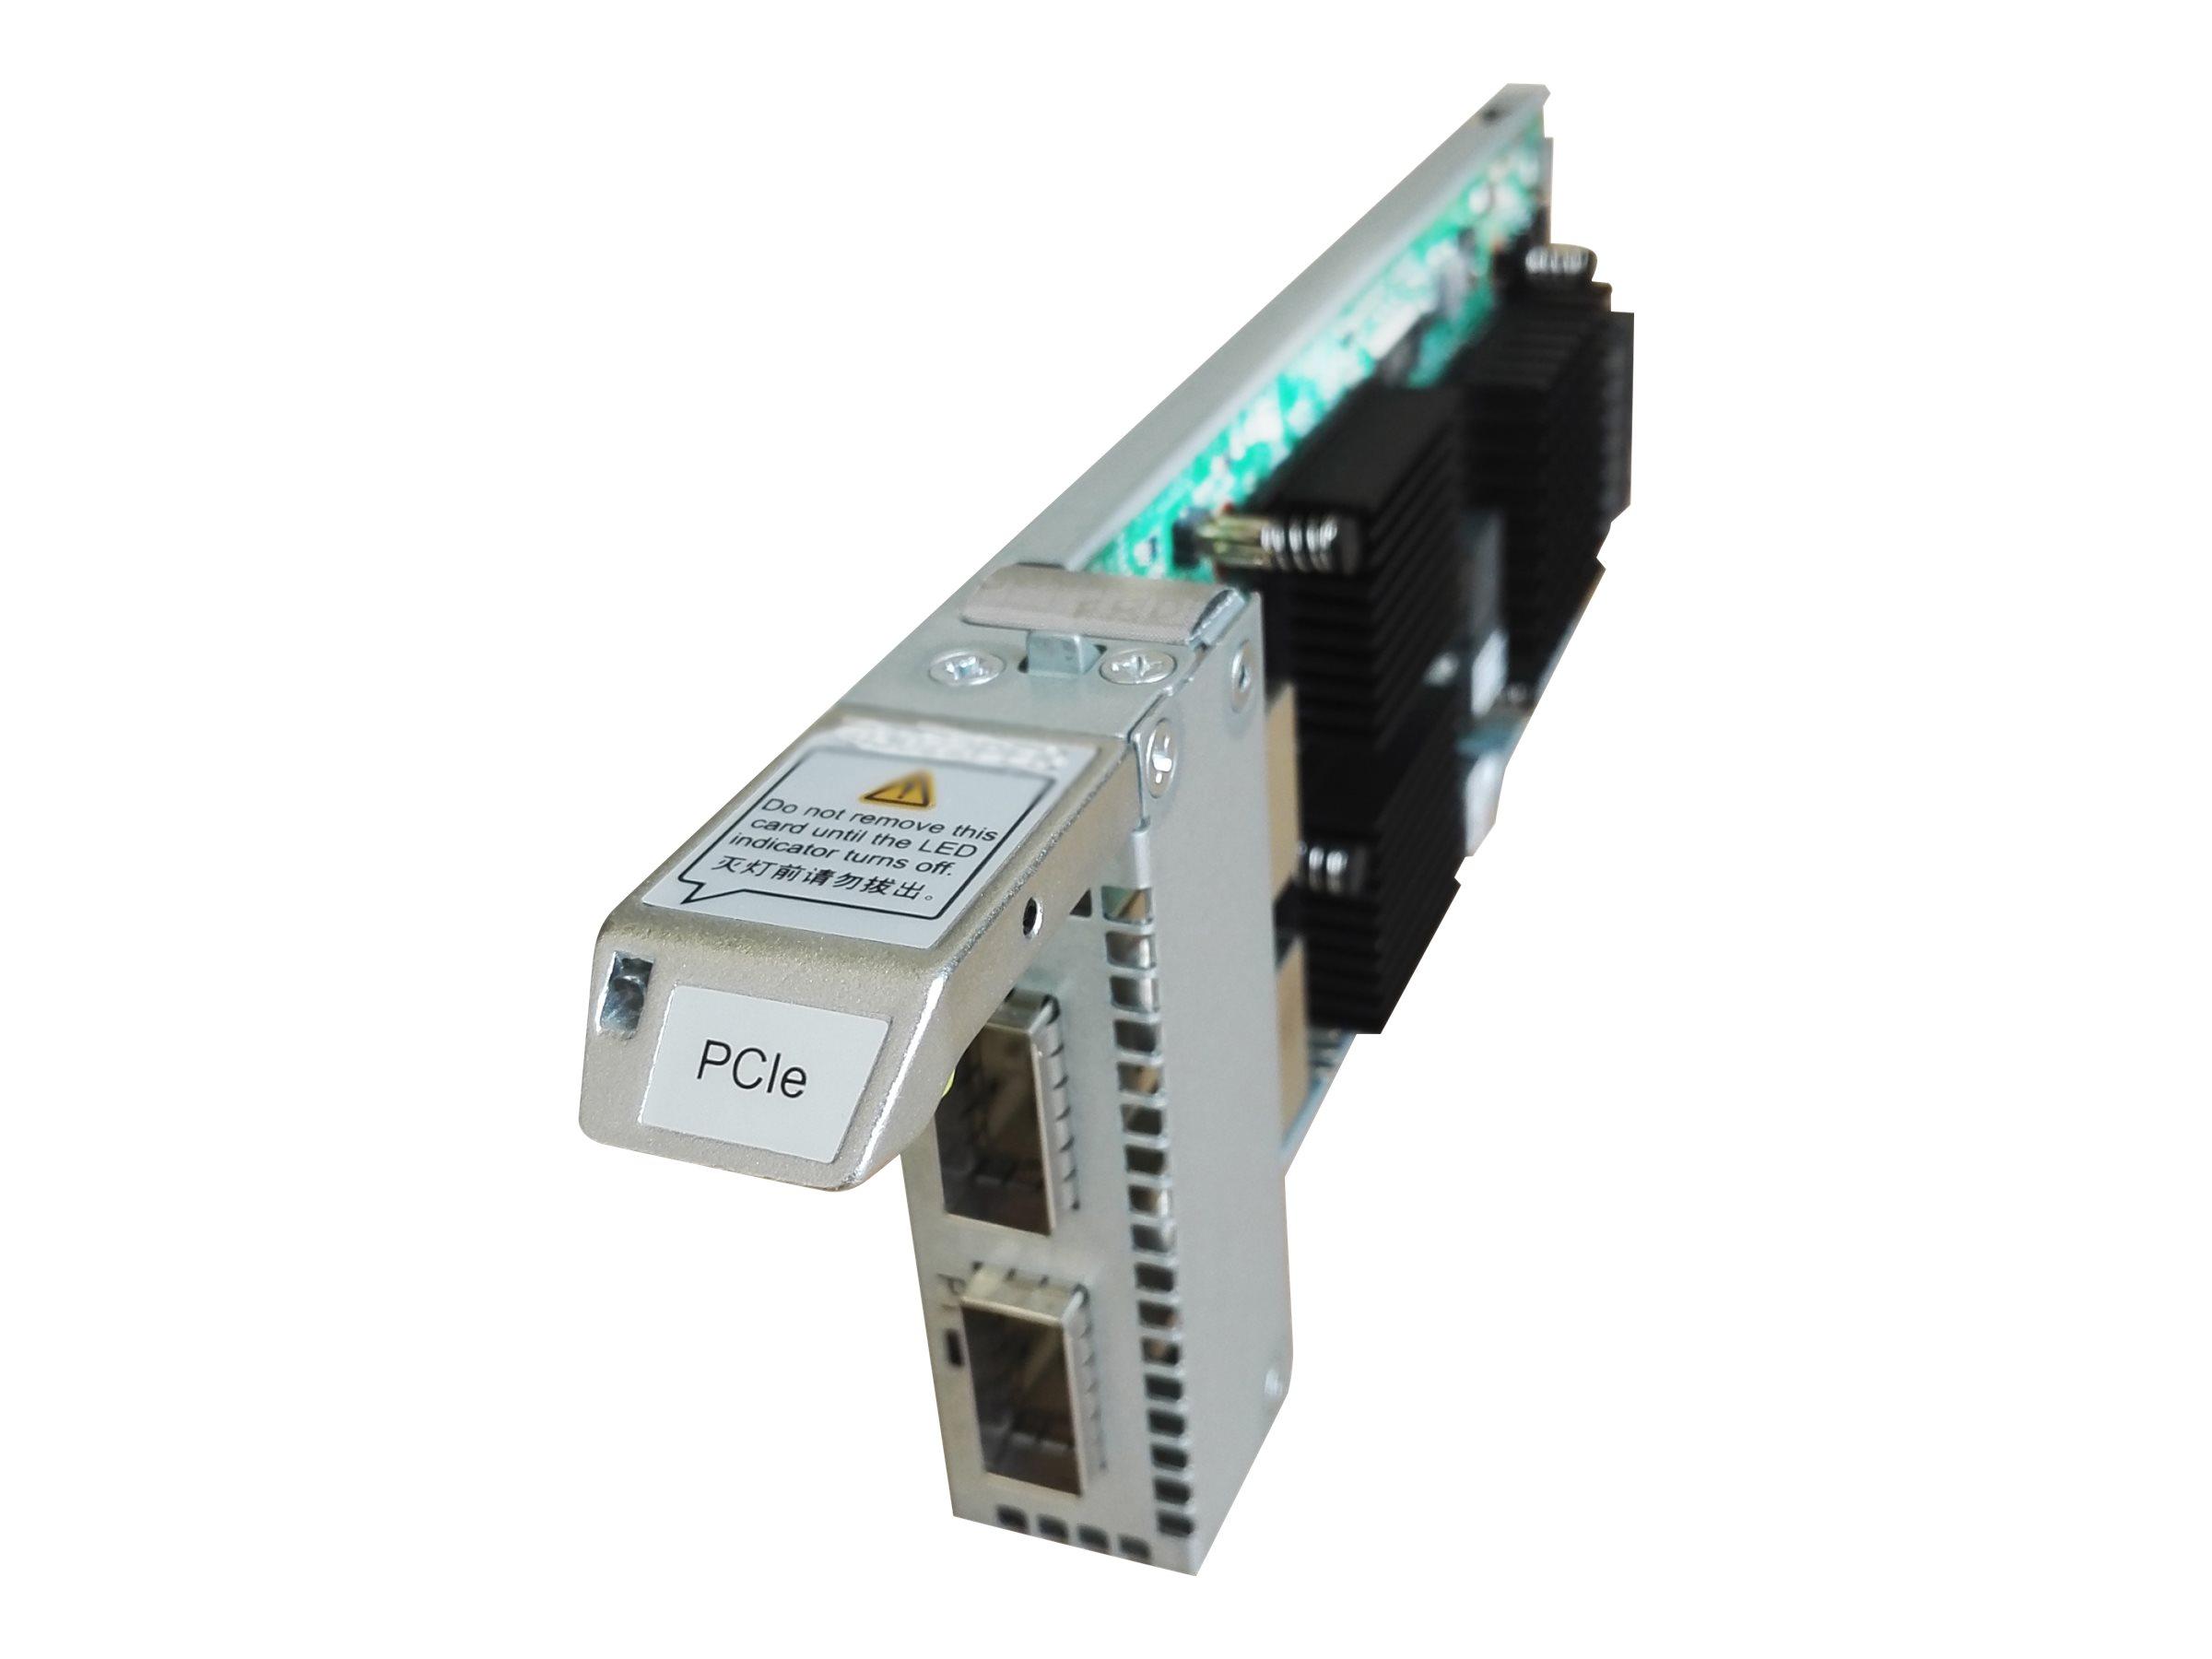 Huawei - Erweiterungsmodul - PCIe 2